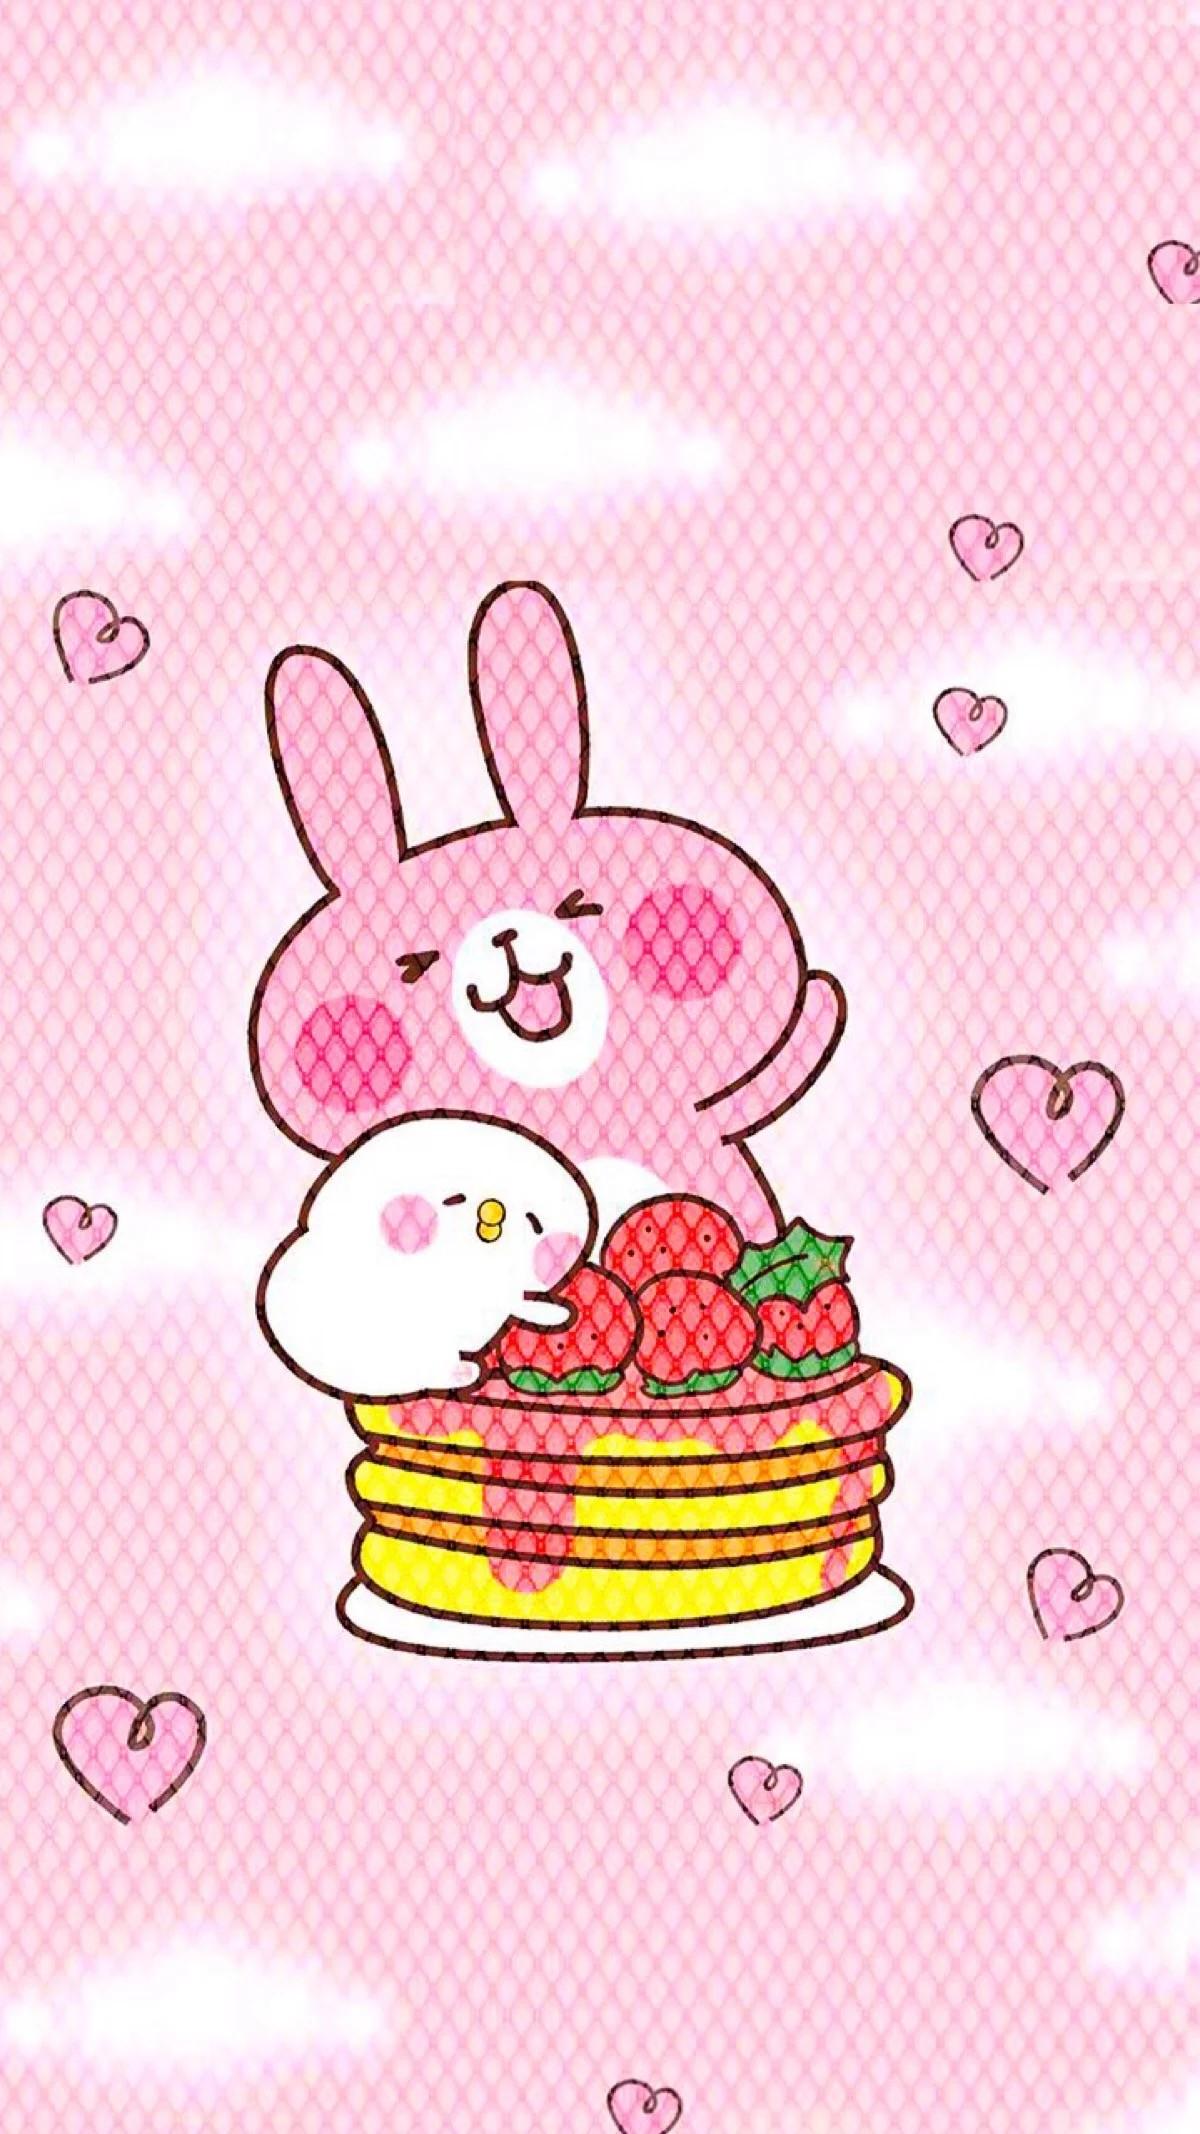 Cute Cartoon, Rilakkuma, Random Acts, Iphone Wallpaper, Rabbit, Kawaii